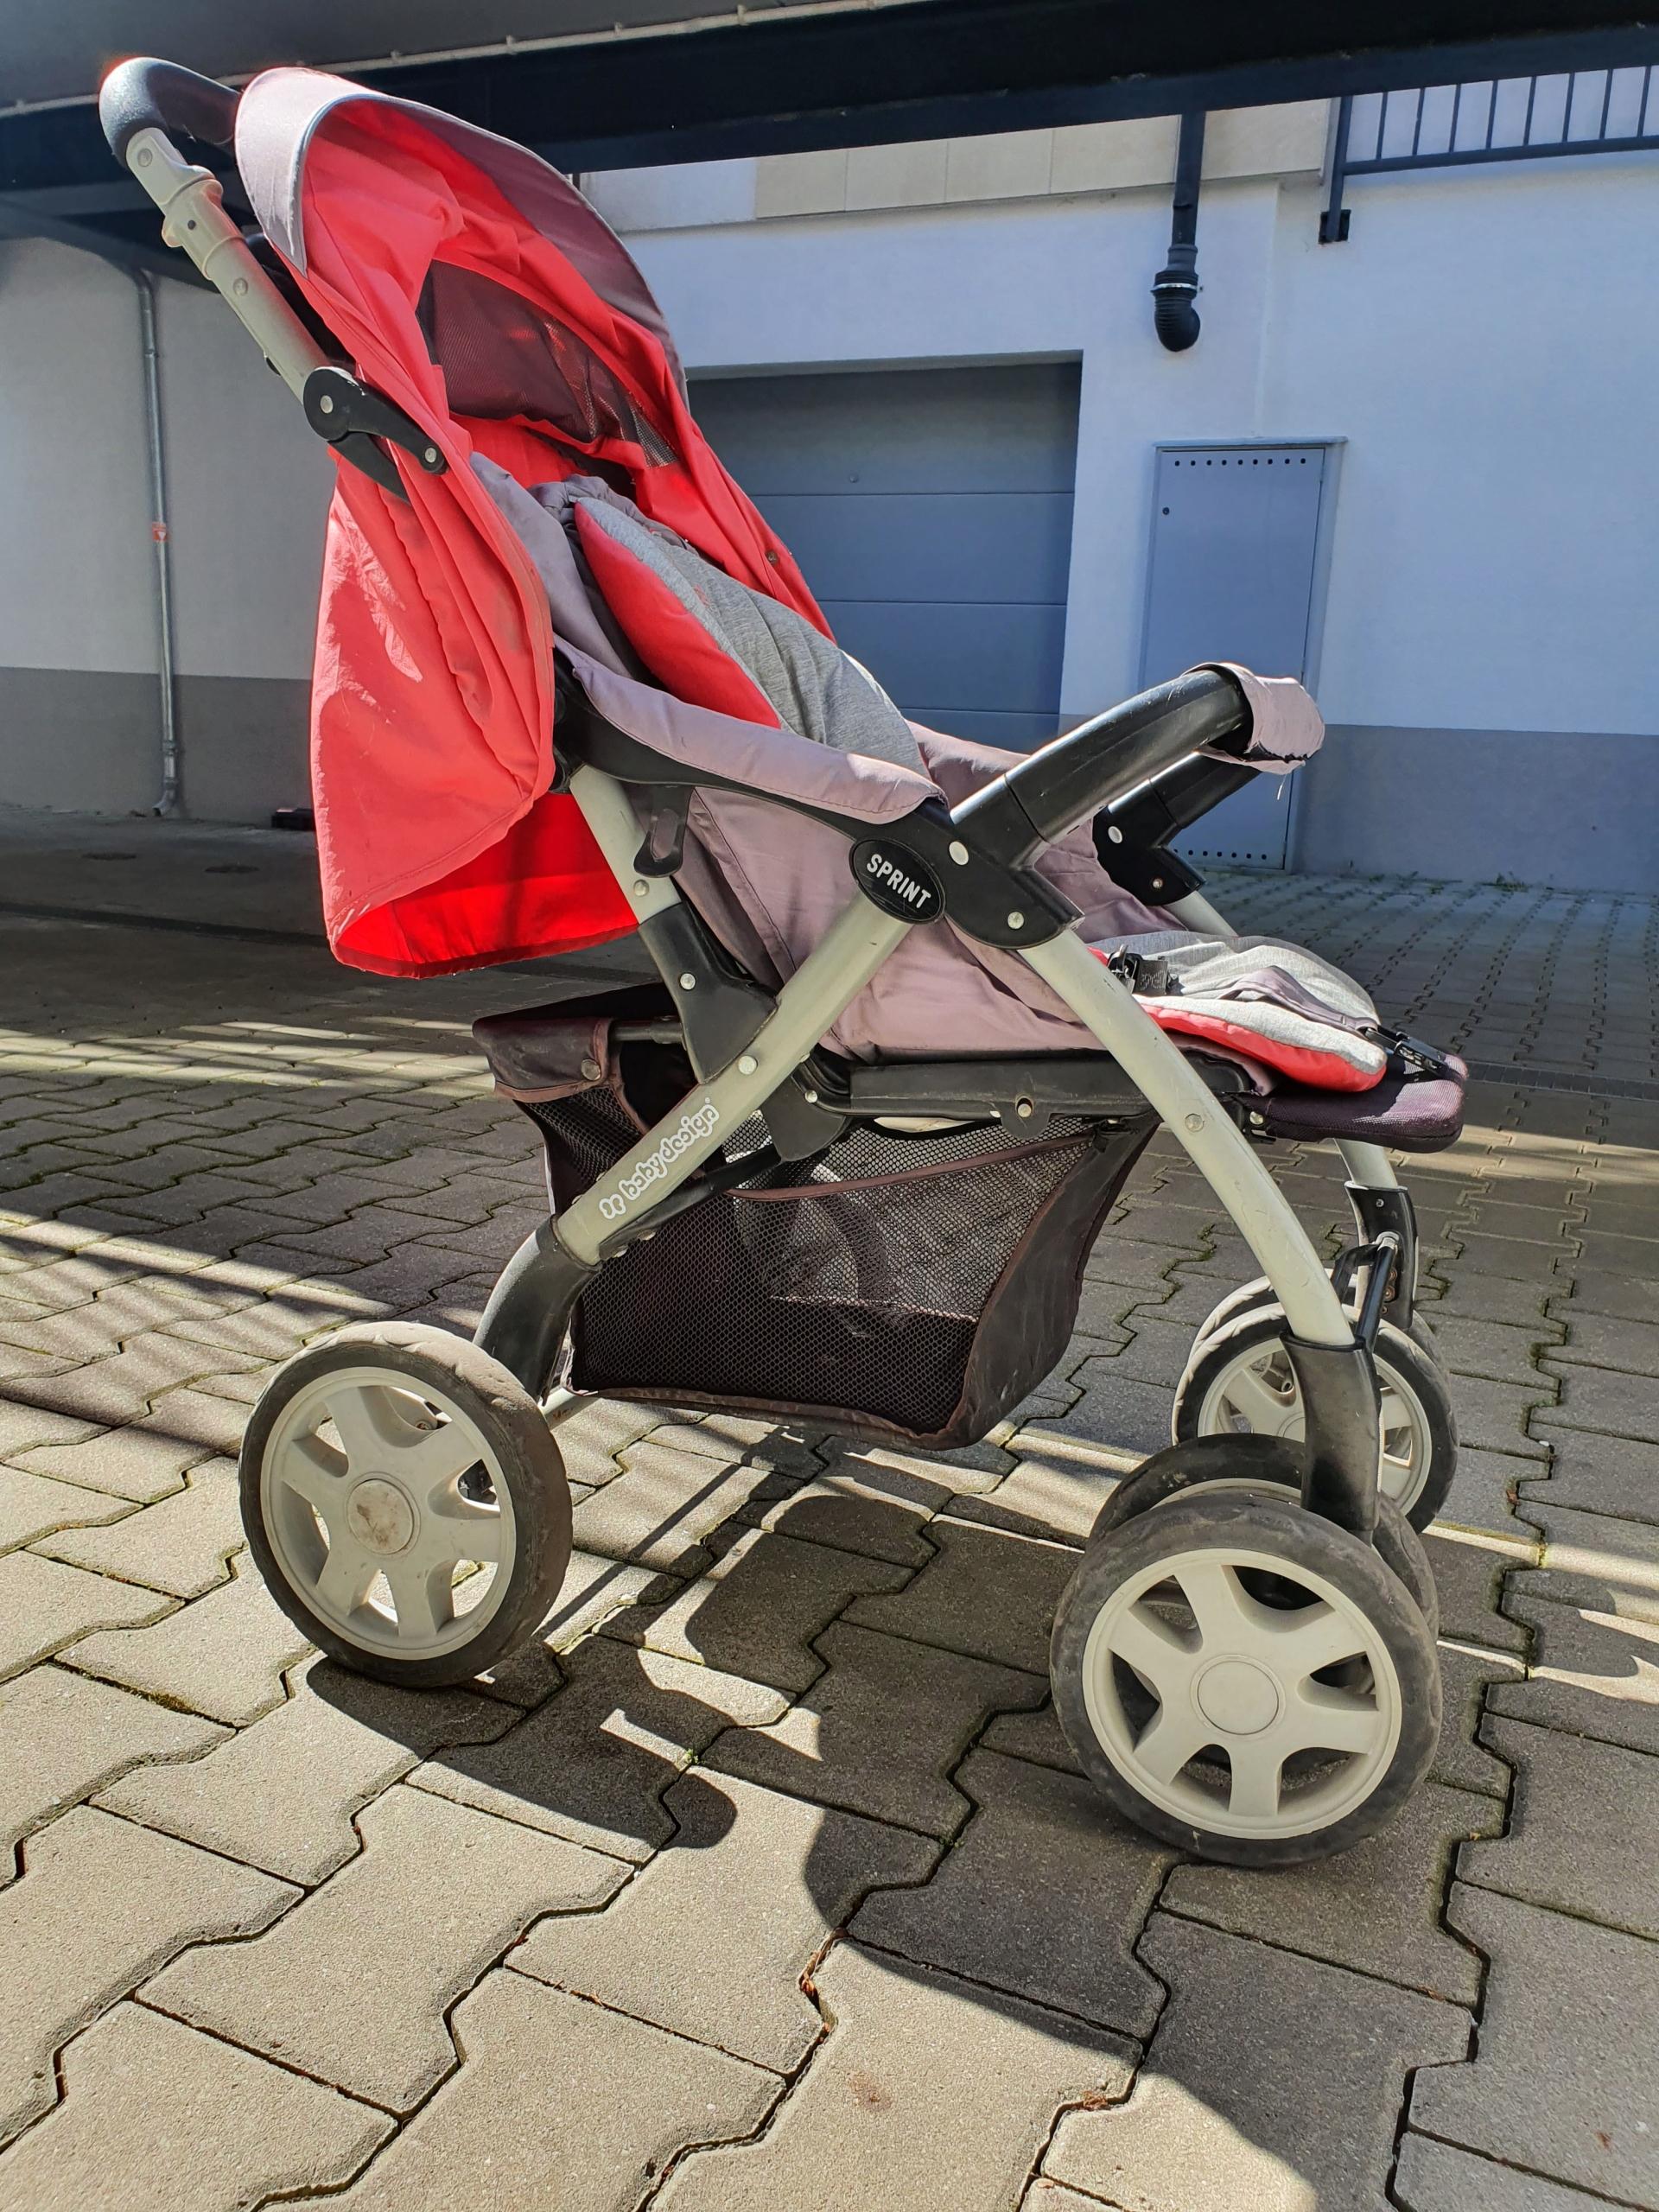 Wozek Spacerowy Baby Design Sprint Spacerowka 9179851210 Allegro Pl